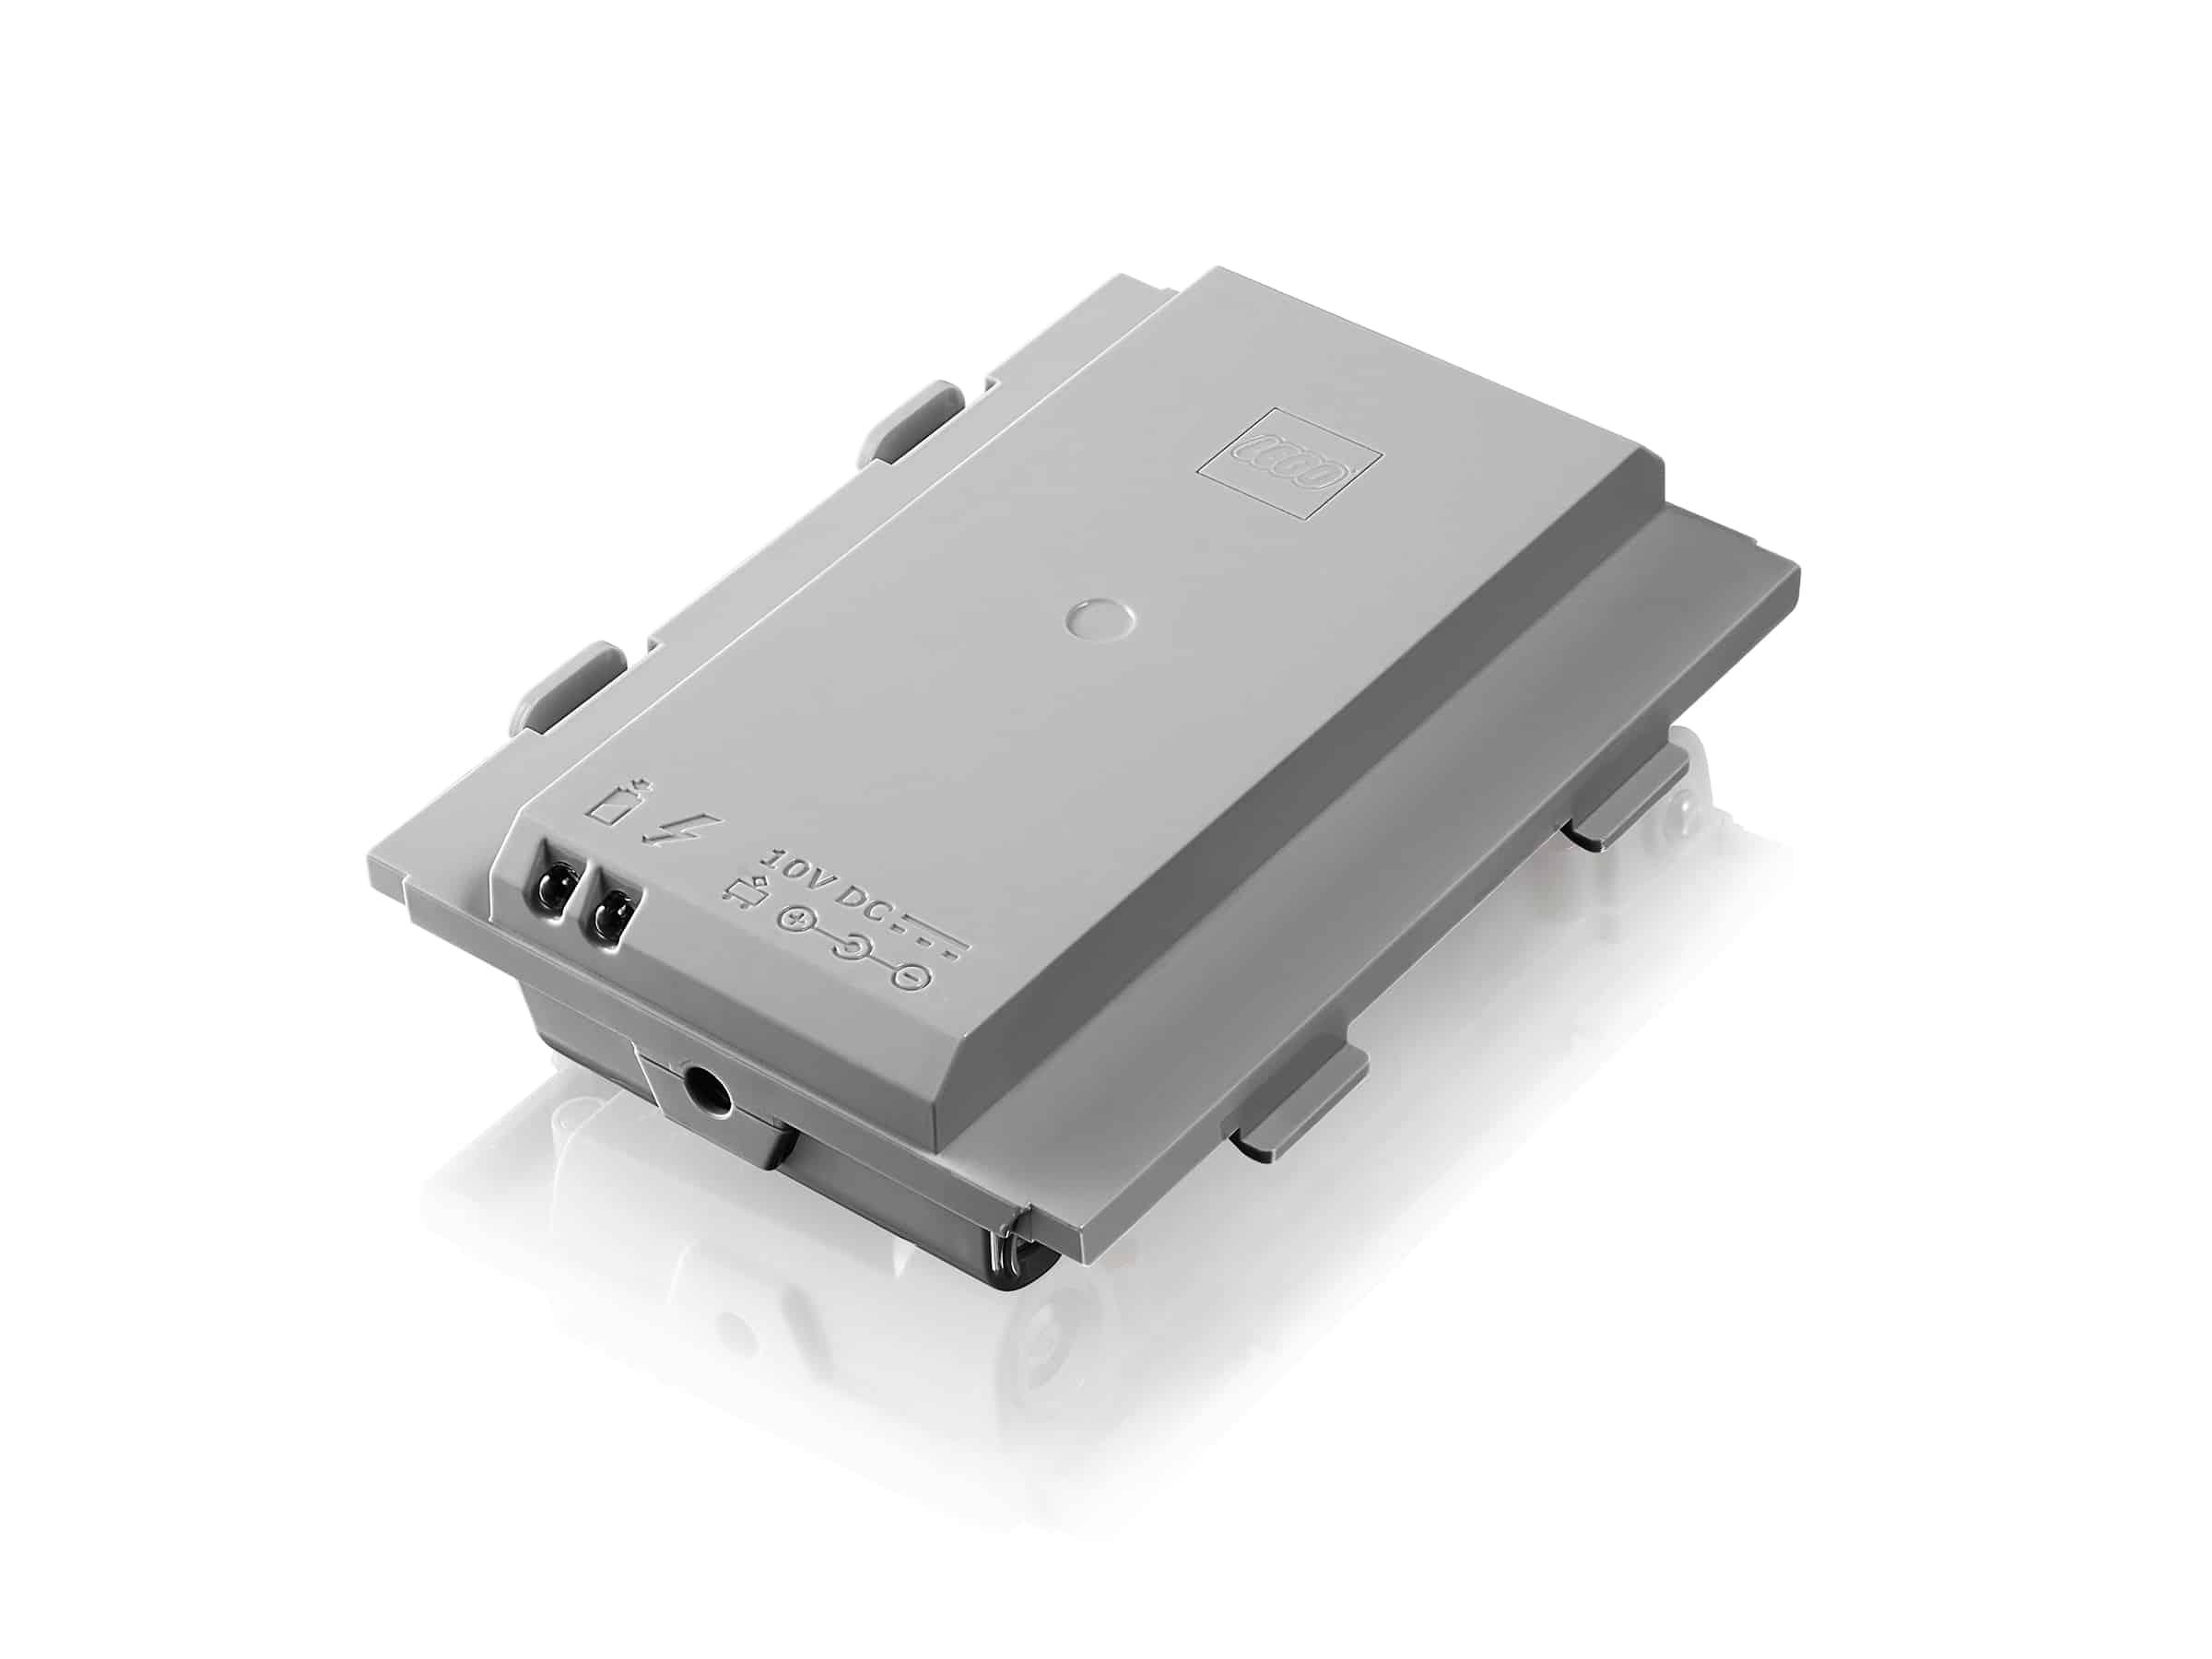 lego 45501 oppladbart ev3 batteri